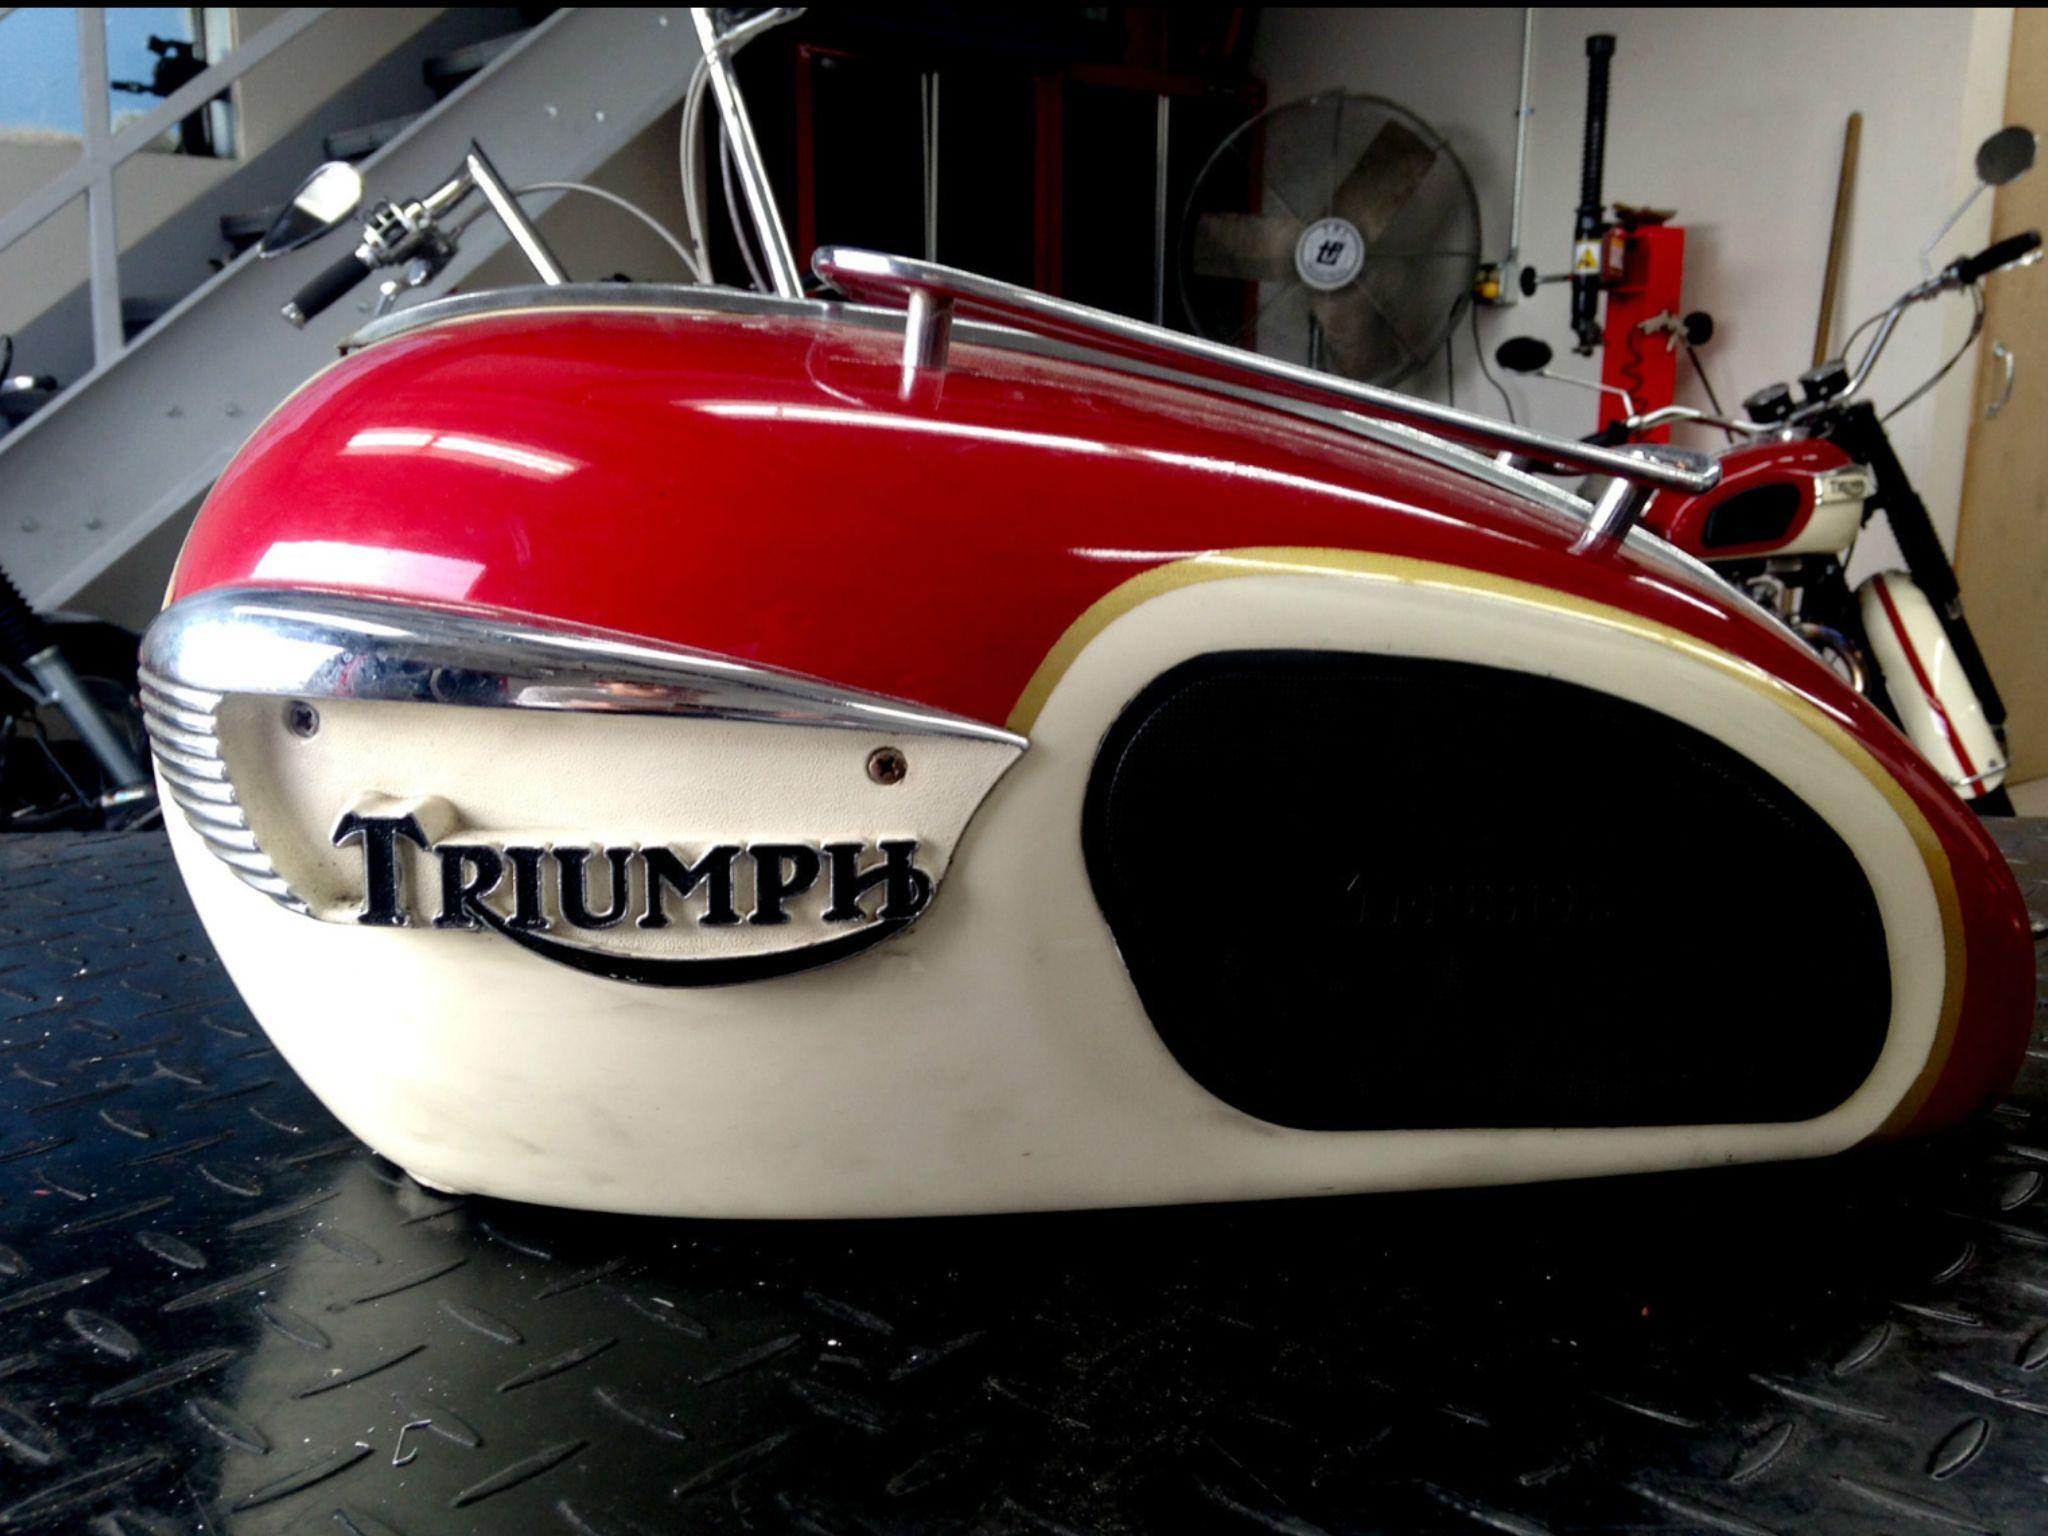 Triumph Motorcycle Gas Tank Classic Motorcycles Triumph Bikes